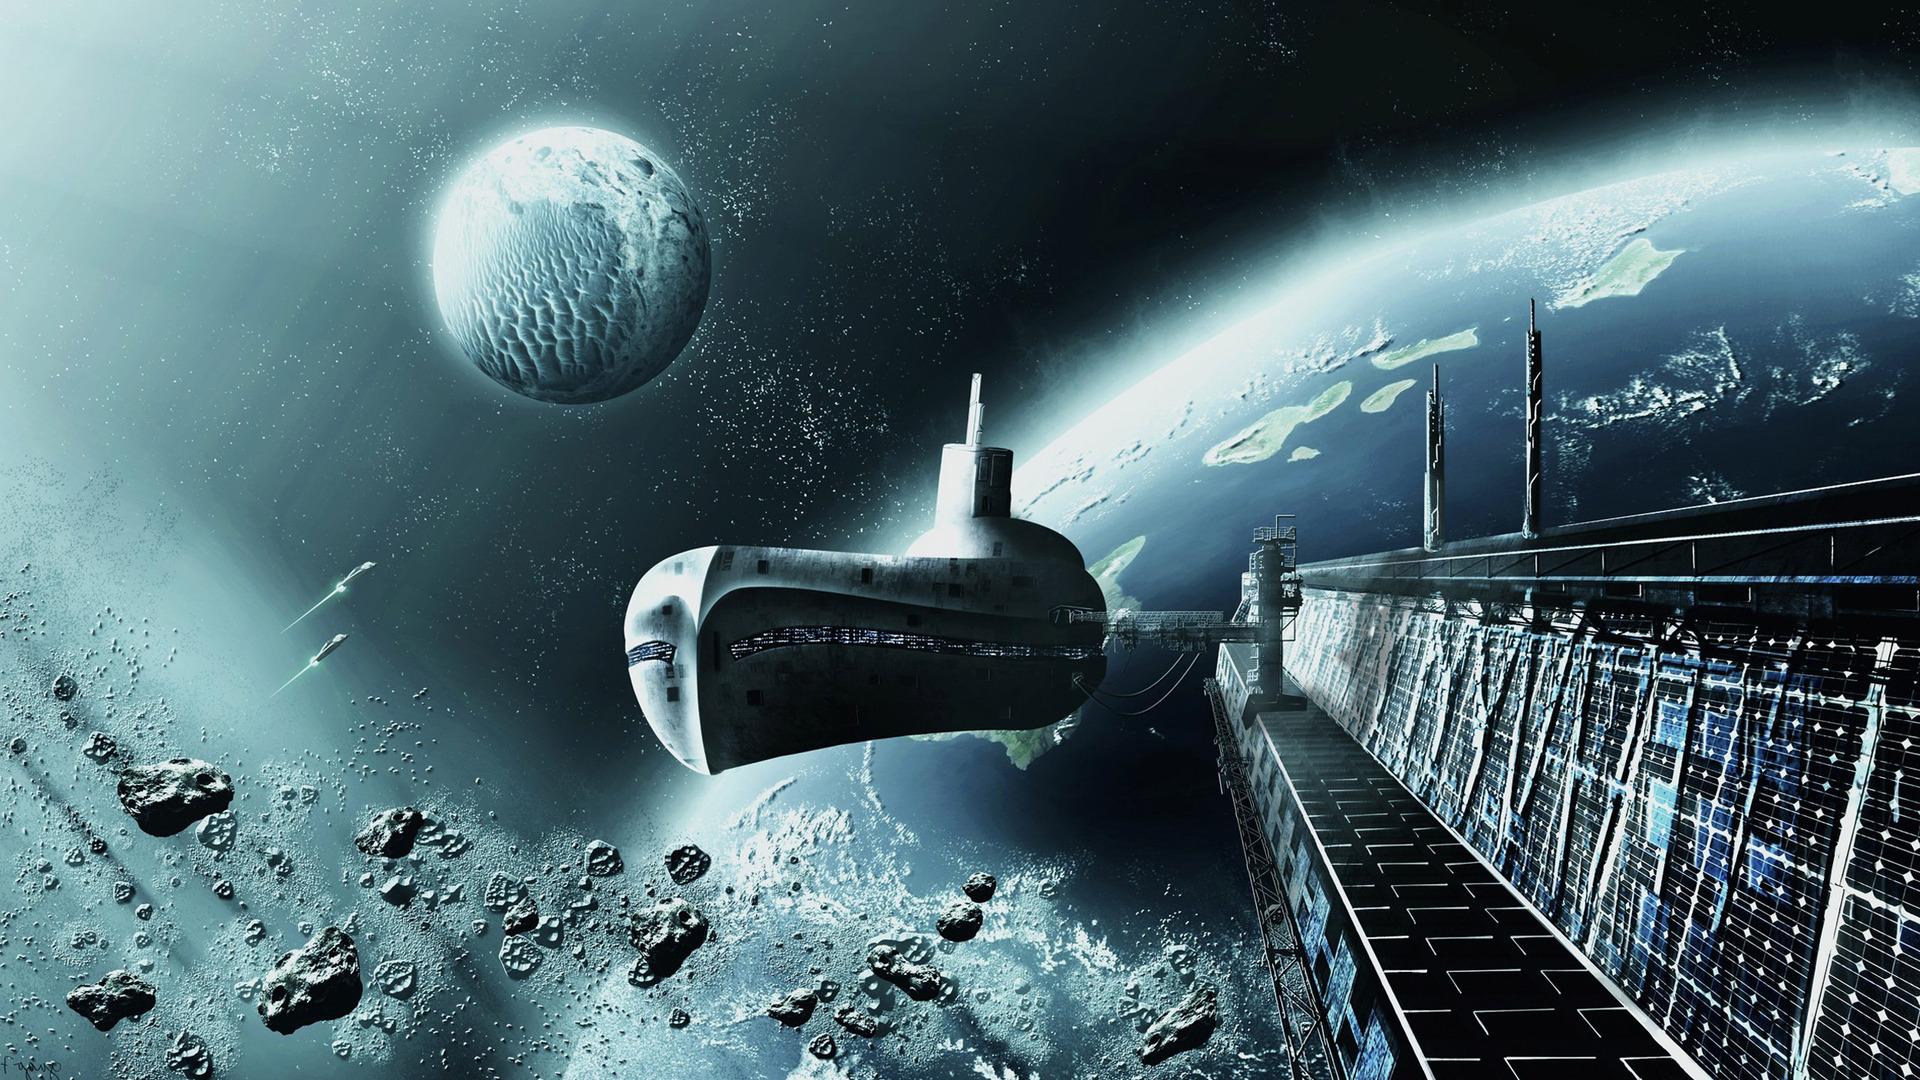 starship pic